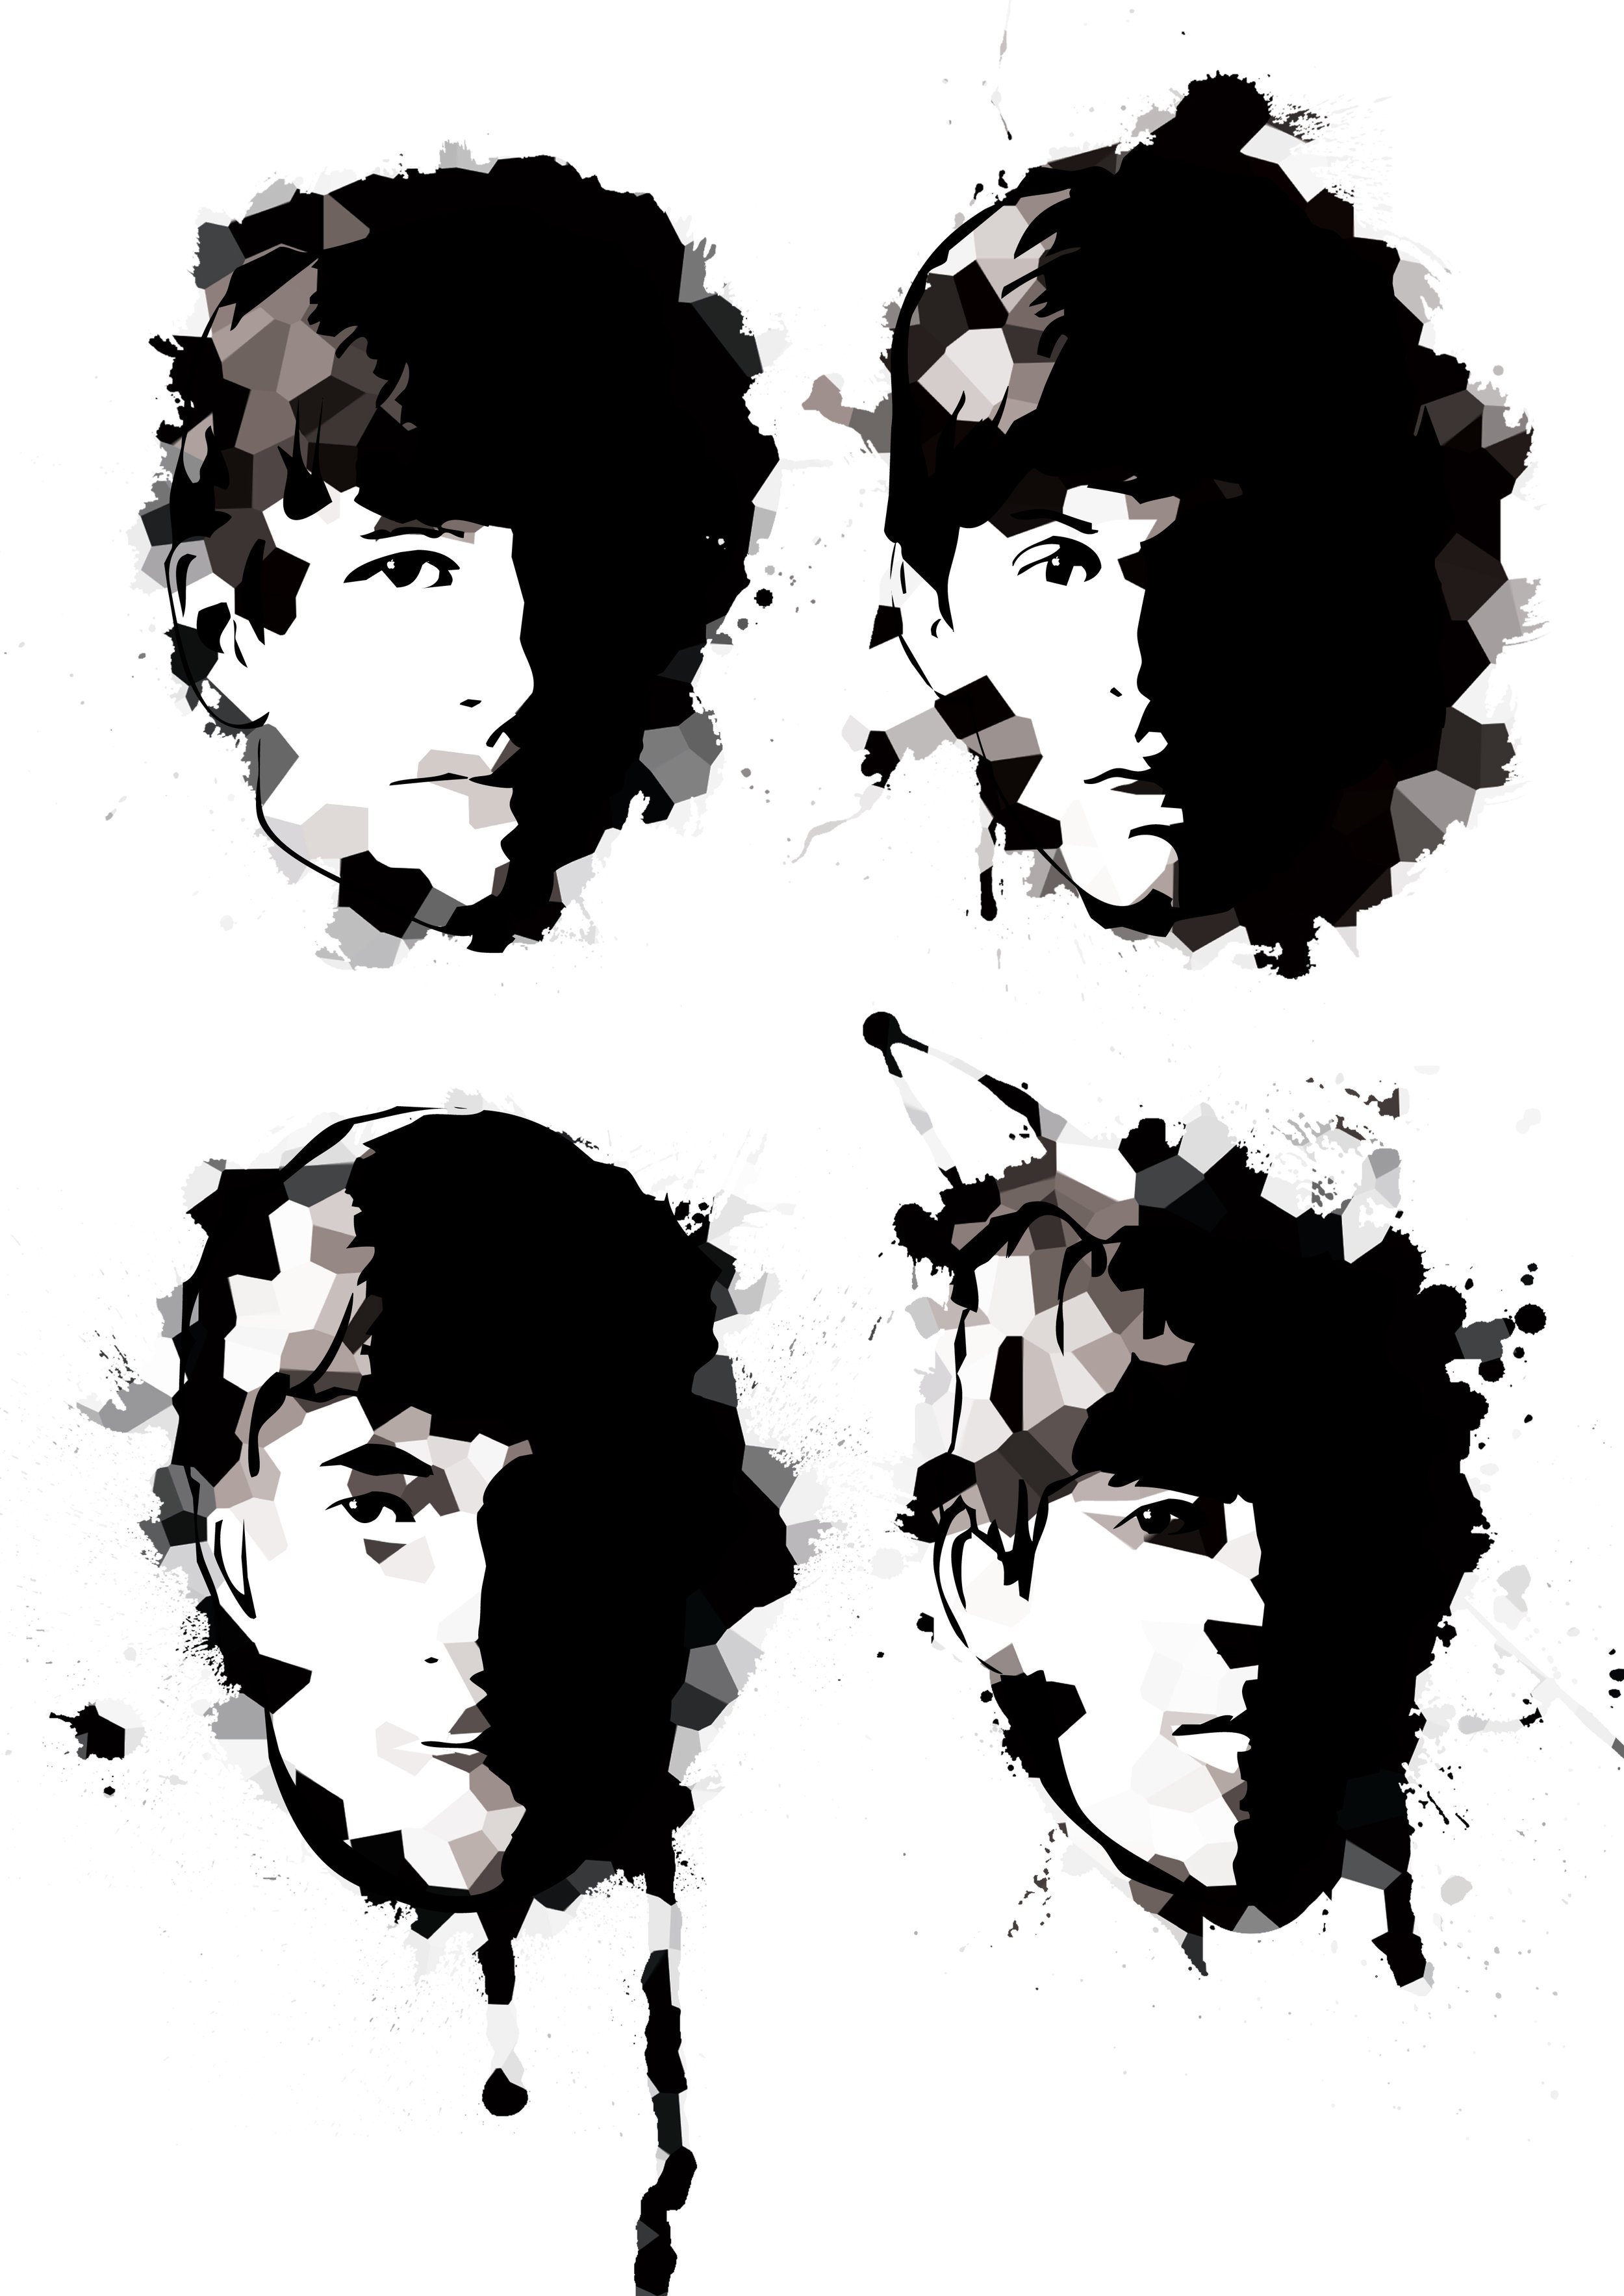 Stencil beatles_6.jpg